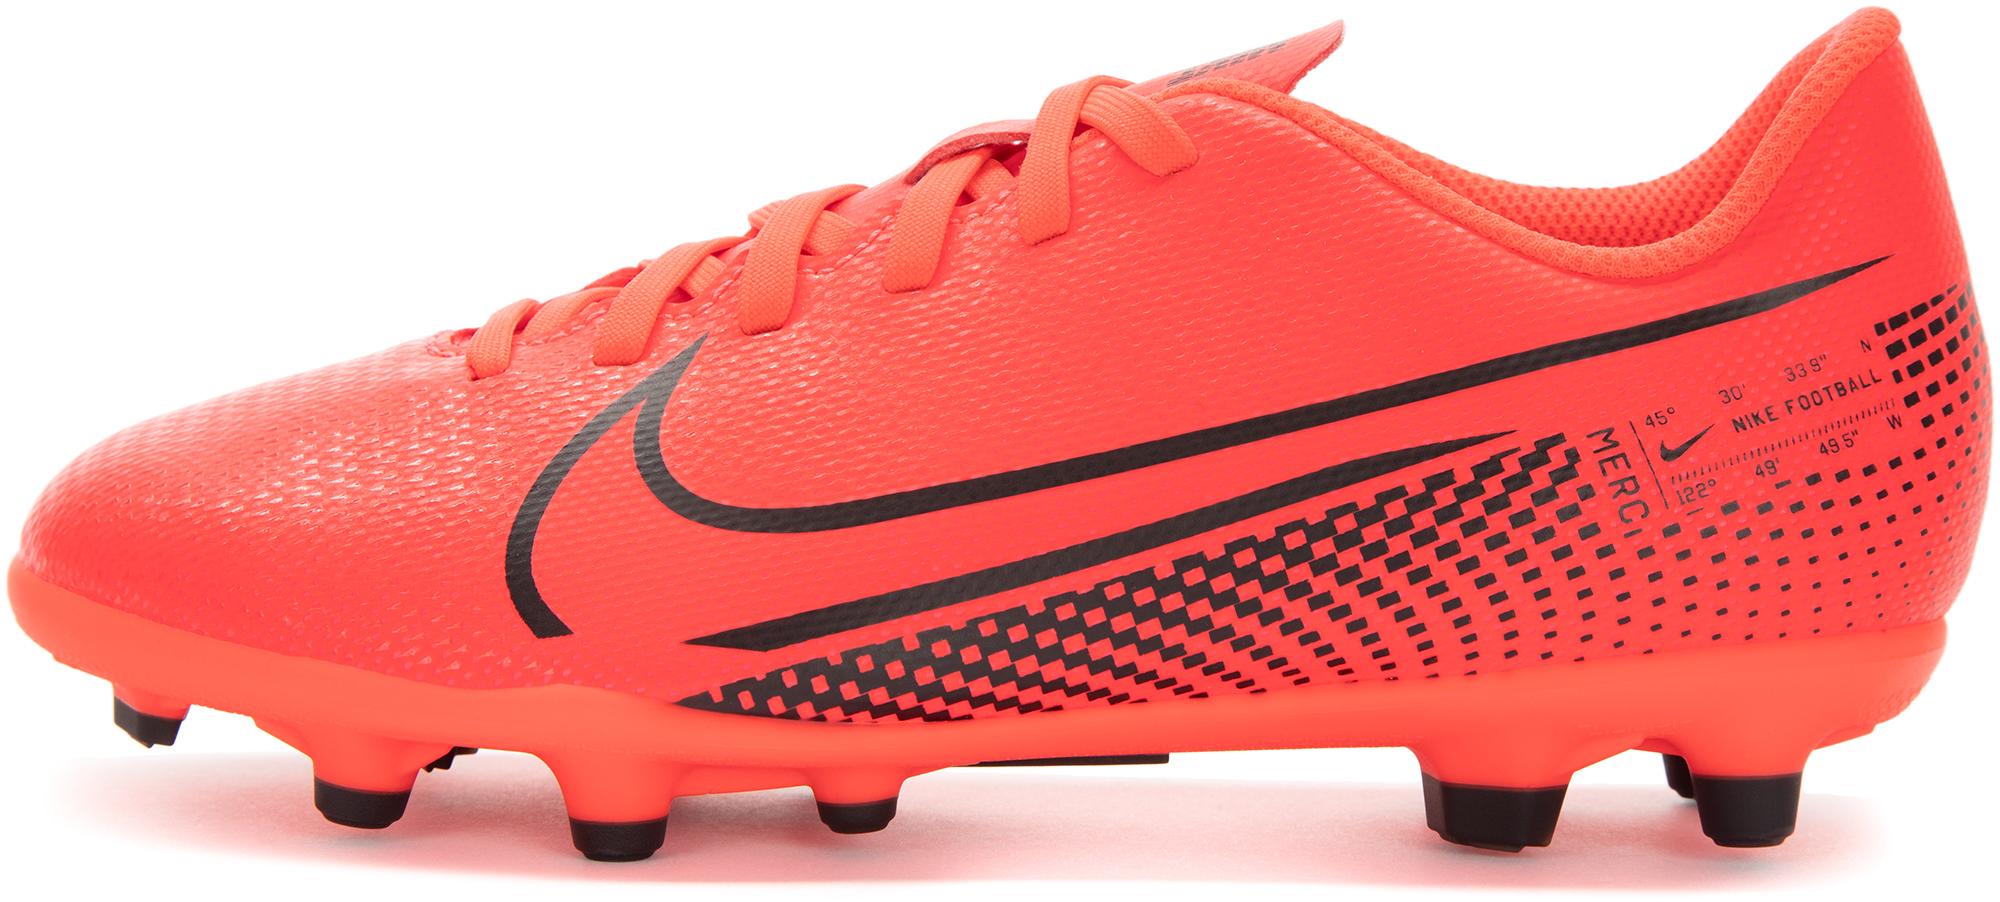 Nike Бутсы для мальчиков Nike Vapor 13 Club FG/MG, размер 33 бутсы детские nike vapor 13 club mg ps at8162 010